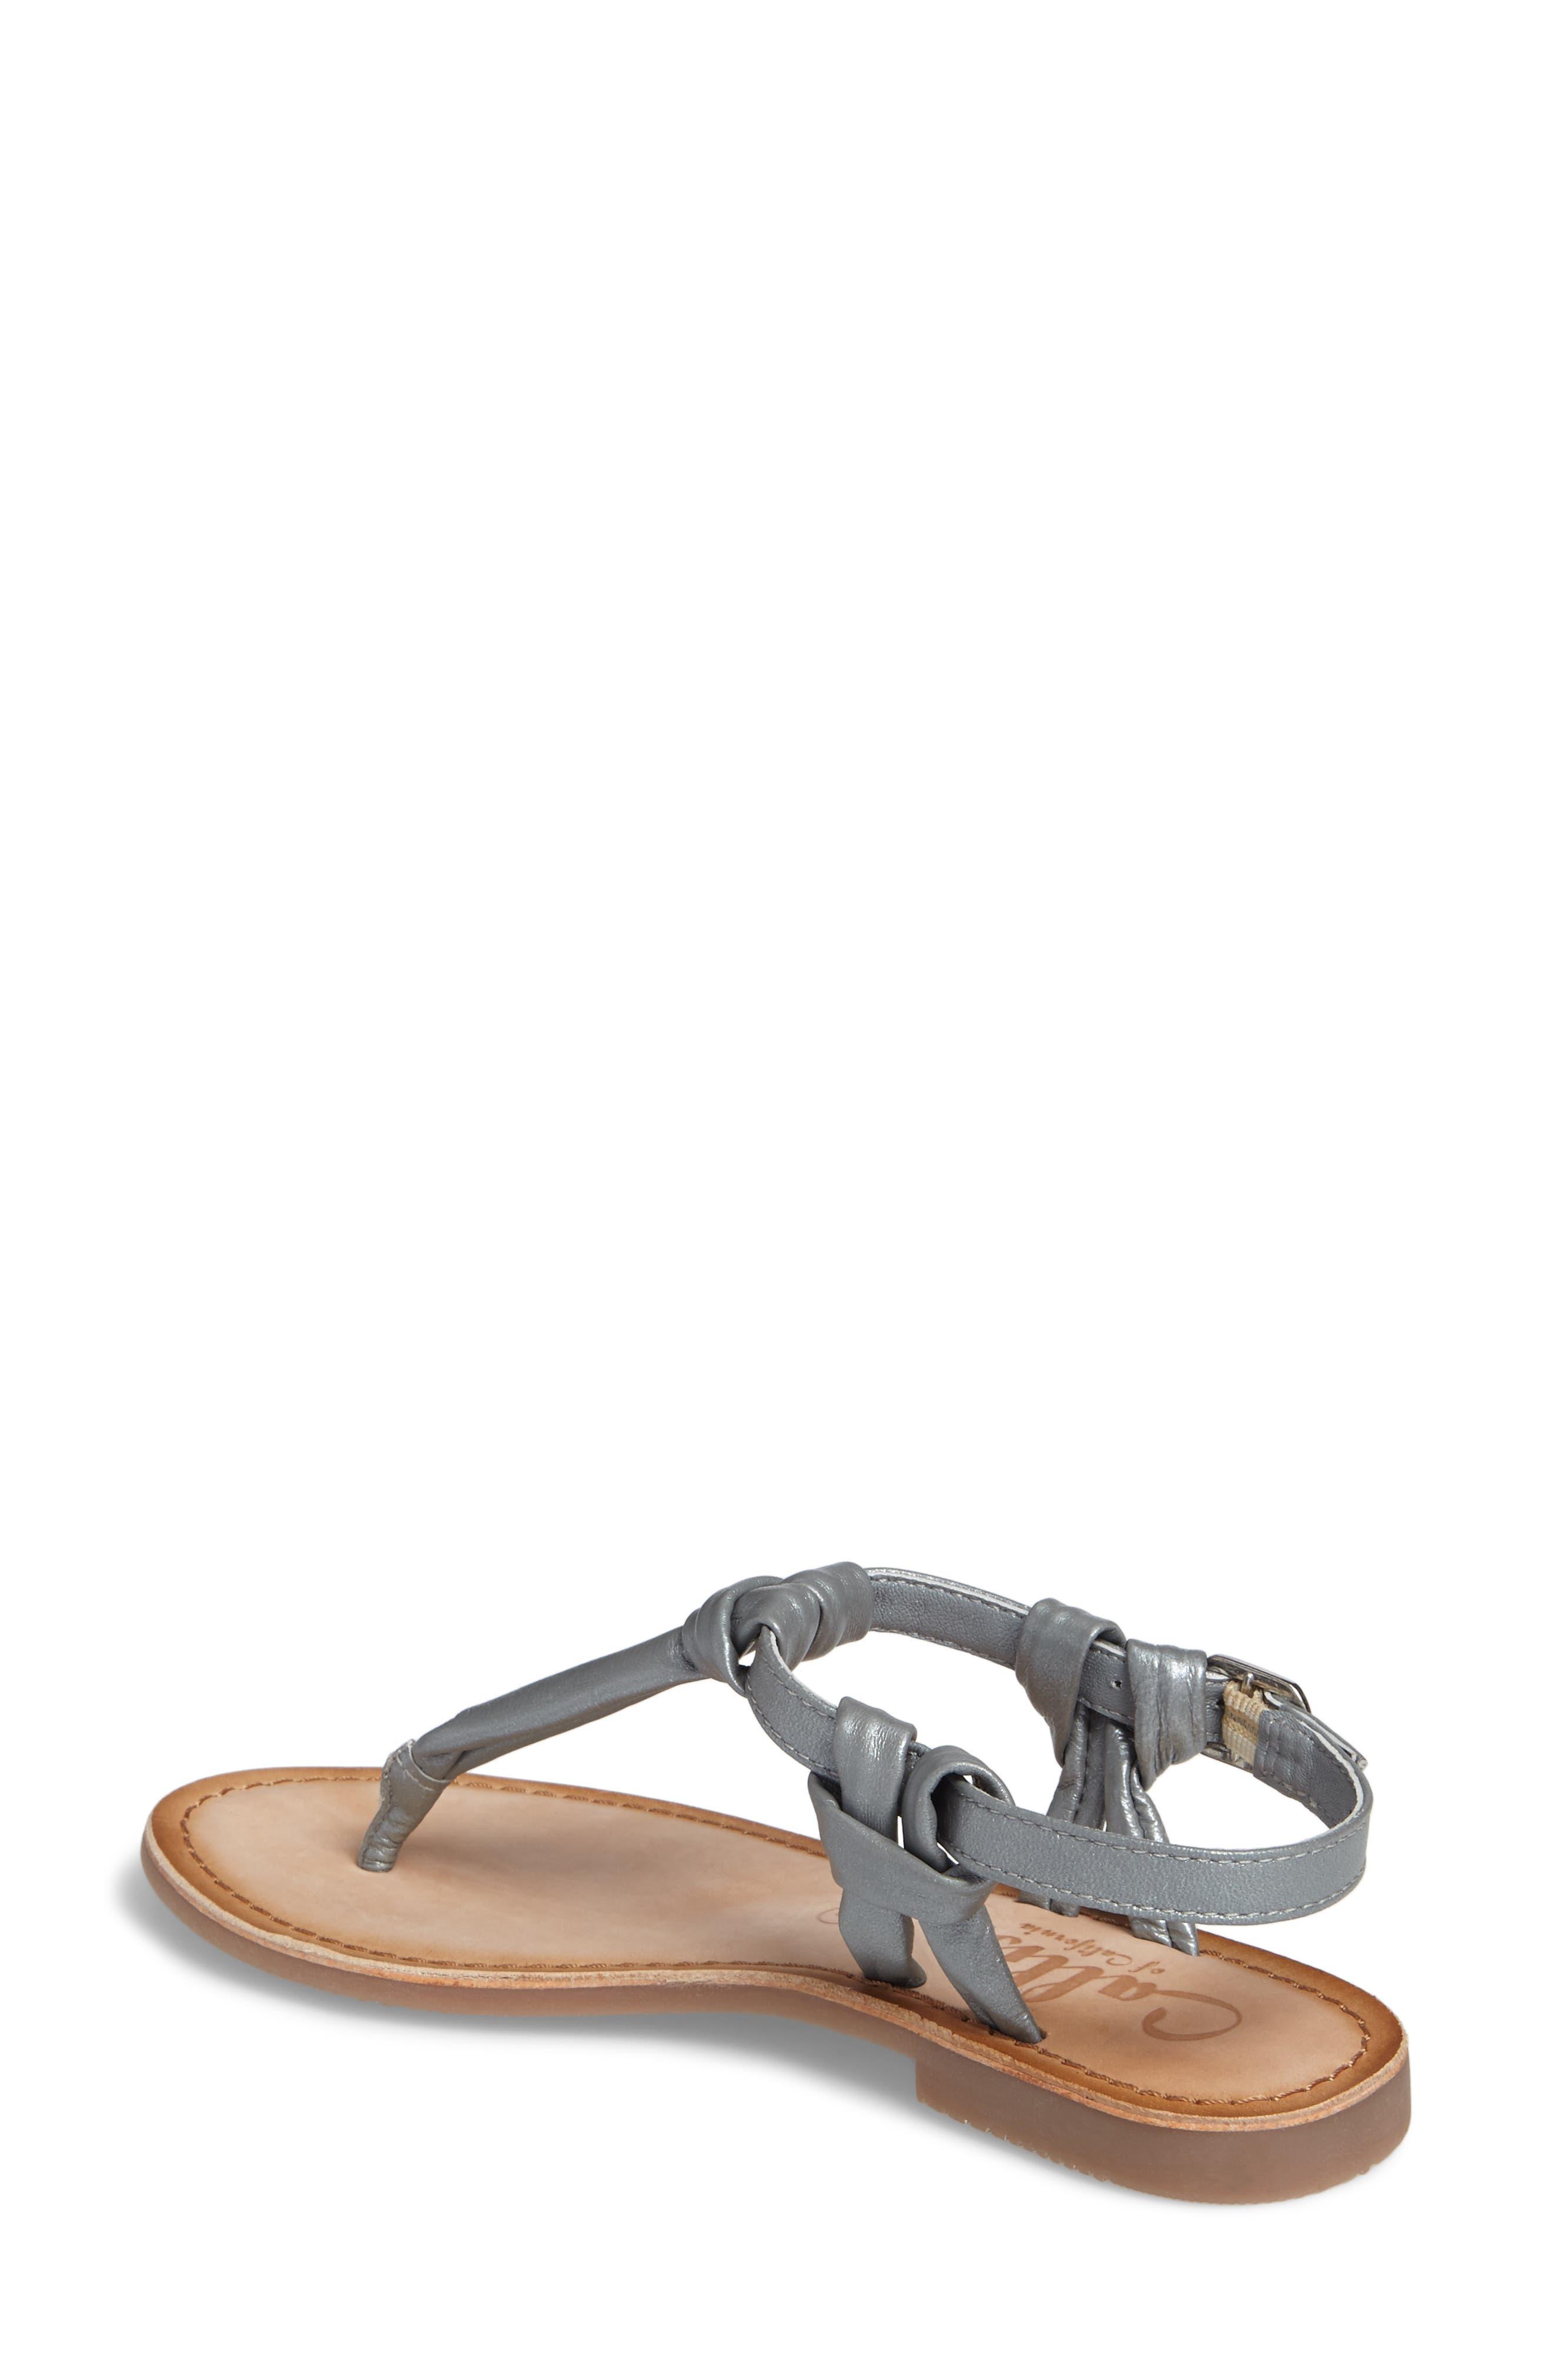 Azza T-Strap Sandal,                             Alternate thumbnail 2, color,                             PEWTER LEATHER